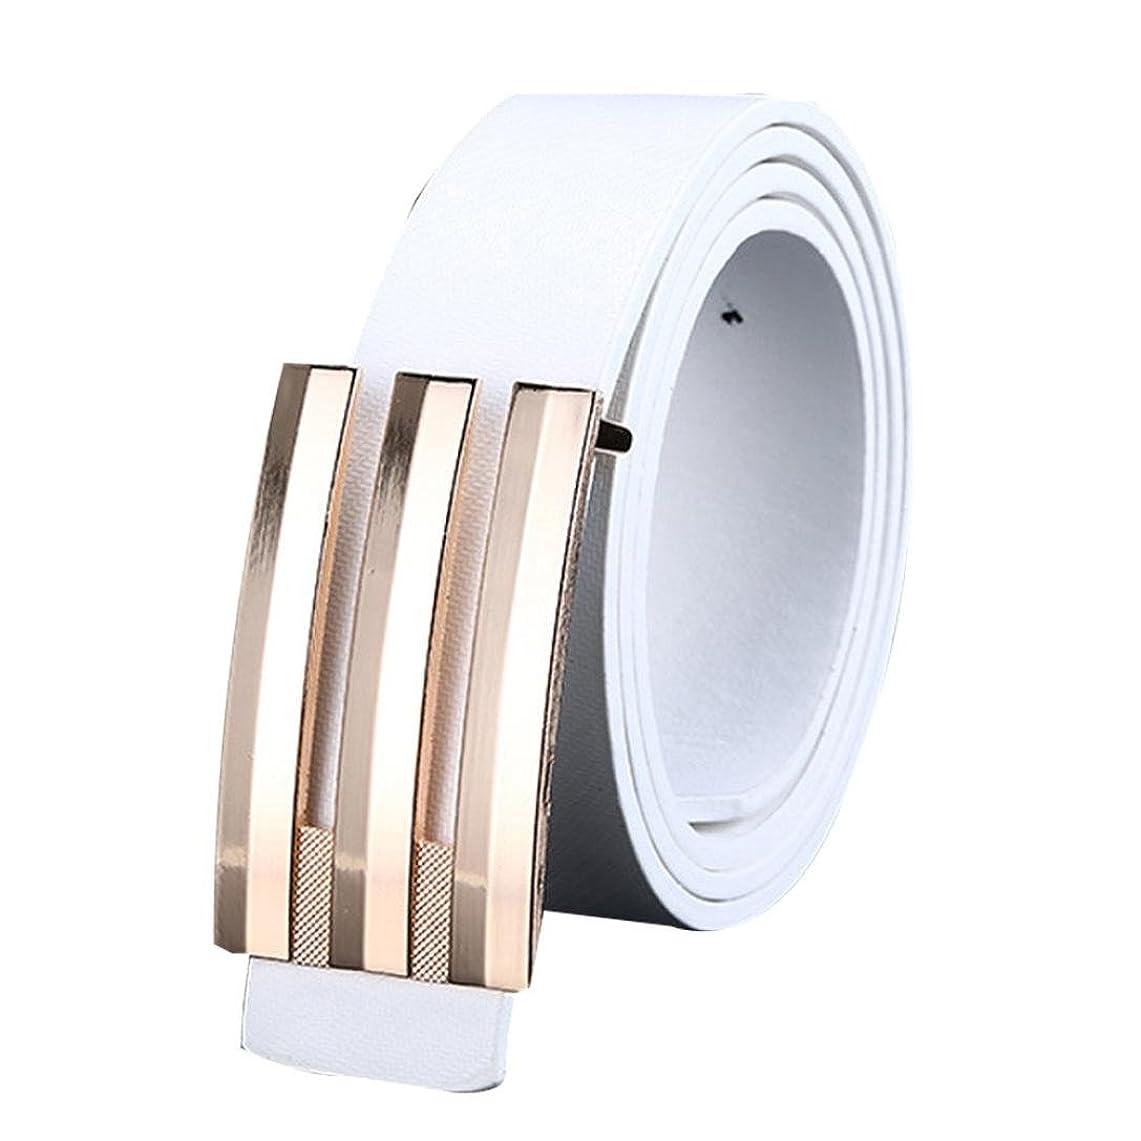 Mhomzawa ベルト メンズ ビジネス ベルト レザー 平滑バックル サイズ調整可能 通勤 ブランド プレゼント男性用 紳士